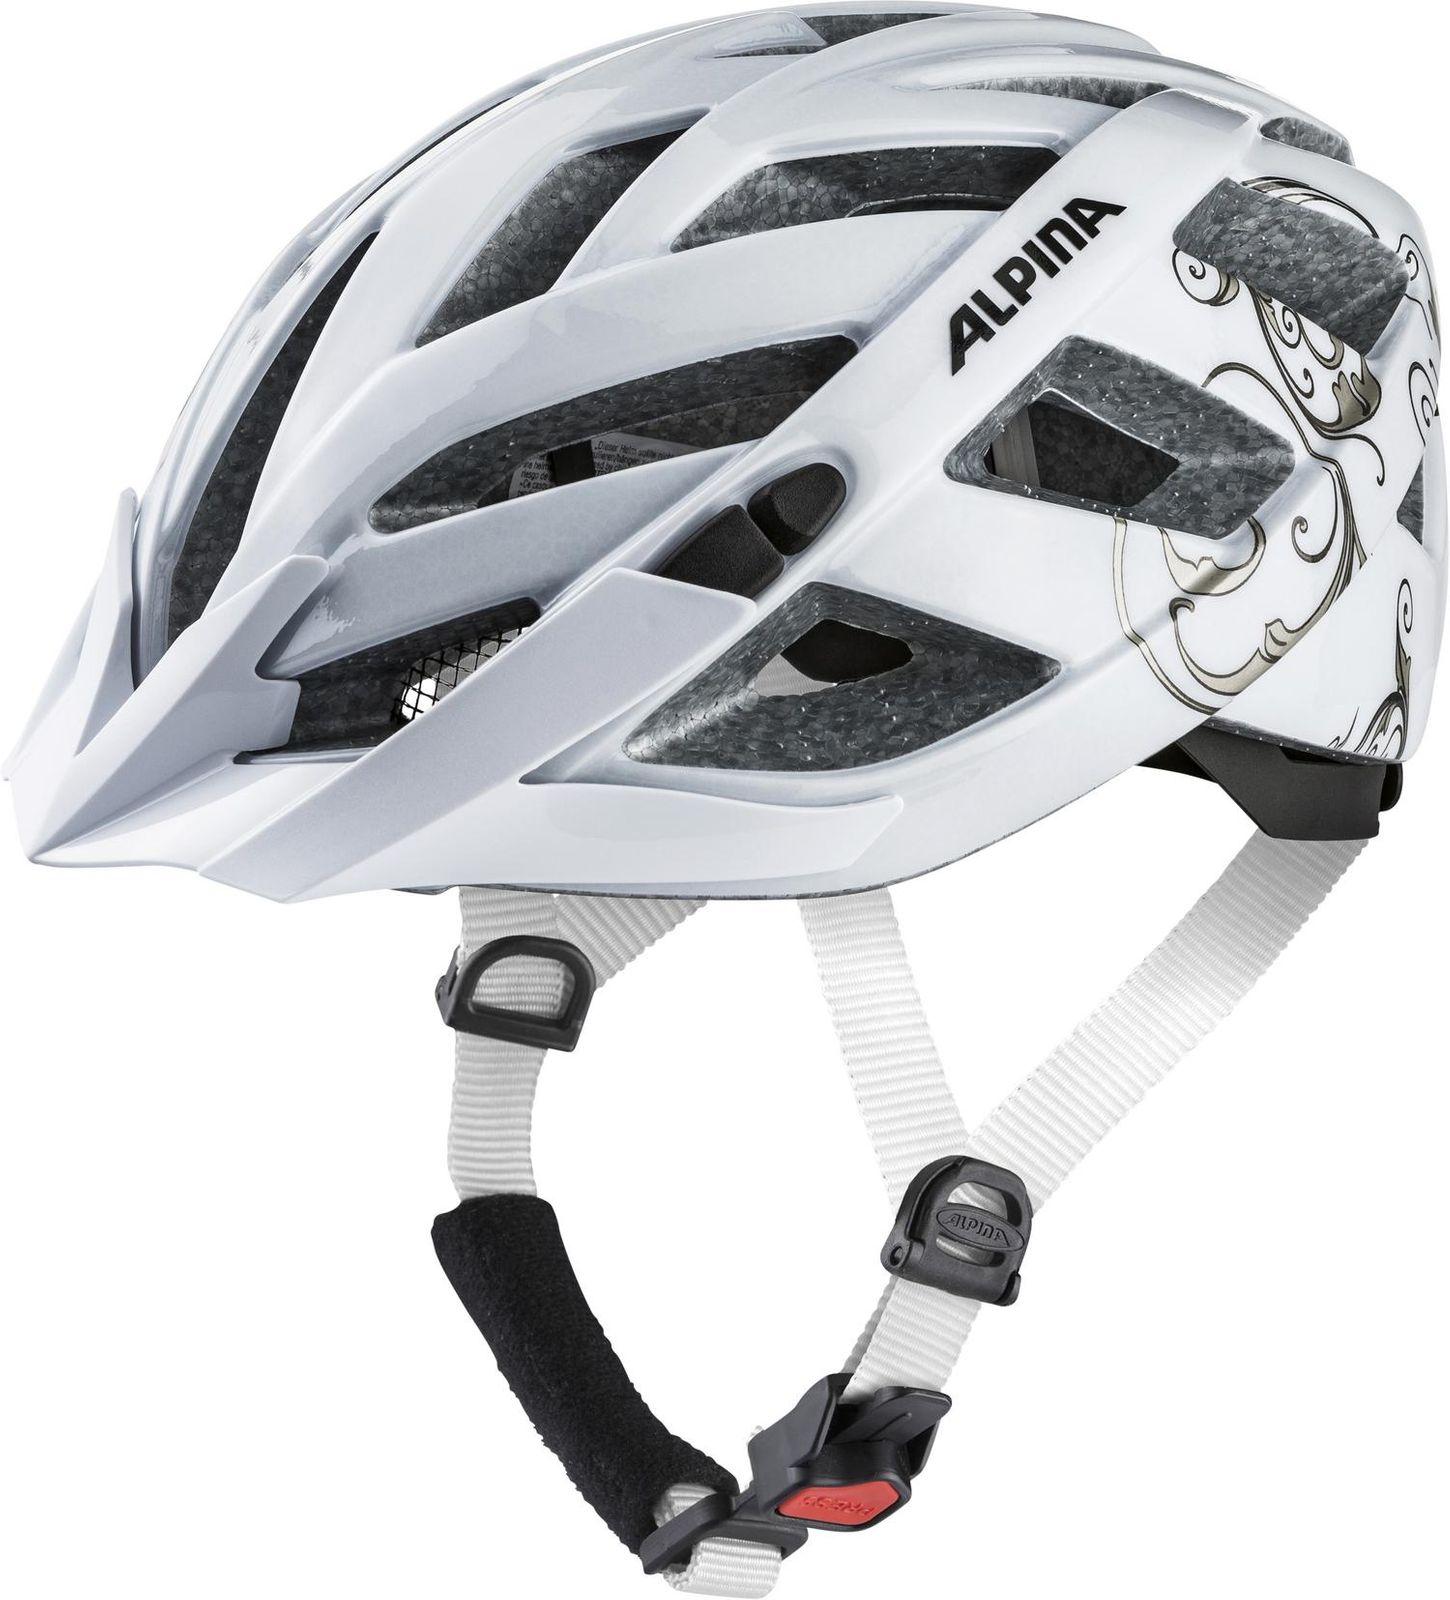 alpina kinder damen radsport fahrrad helm panoma 2 0 weiss prosecco. Black Bedroom Furniture Sets. Home Design Ideas